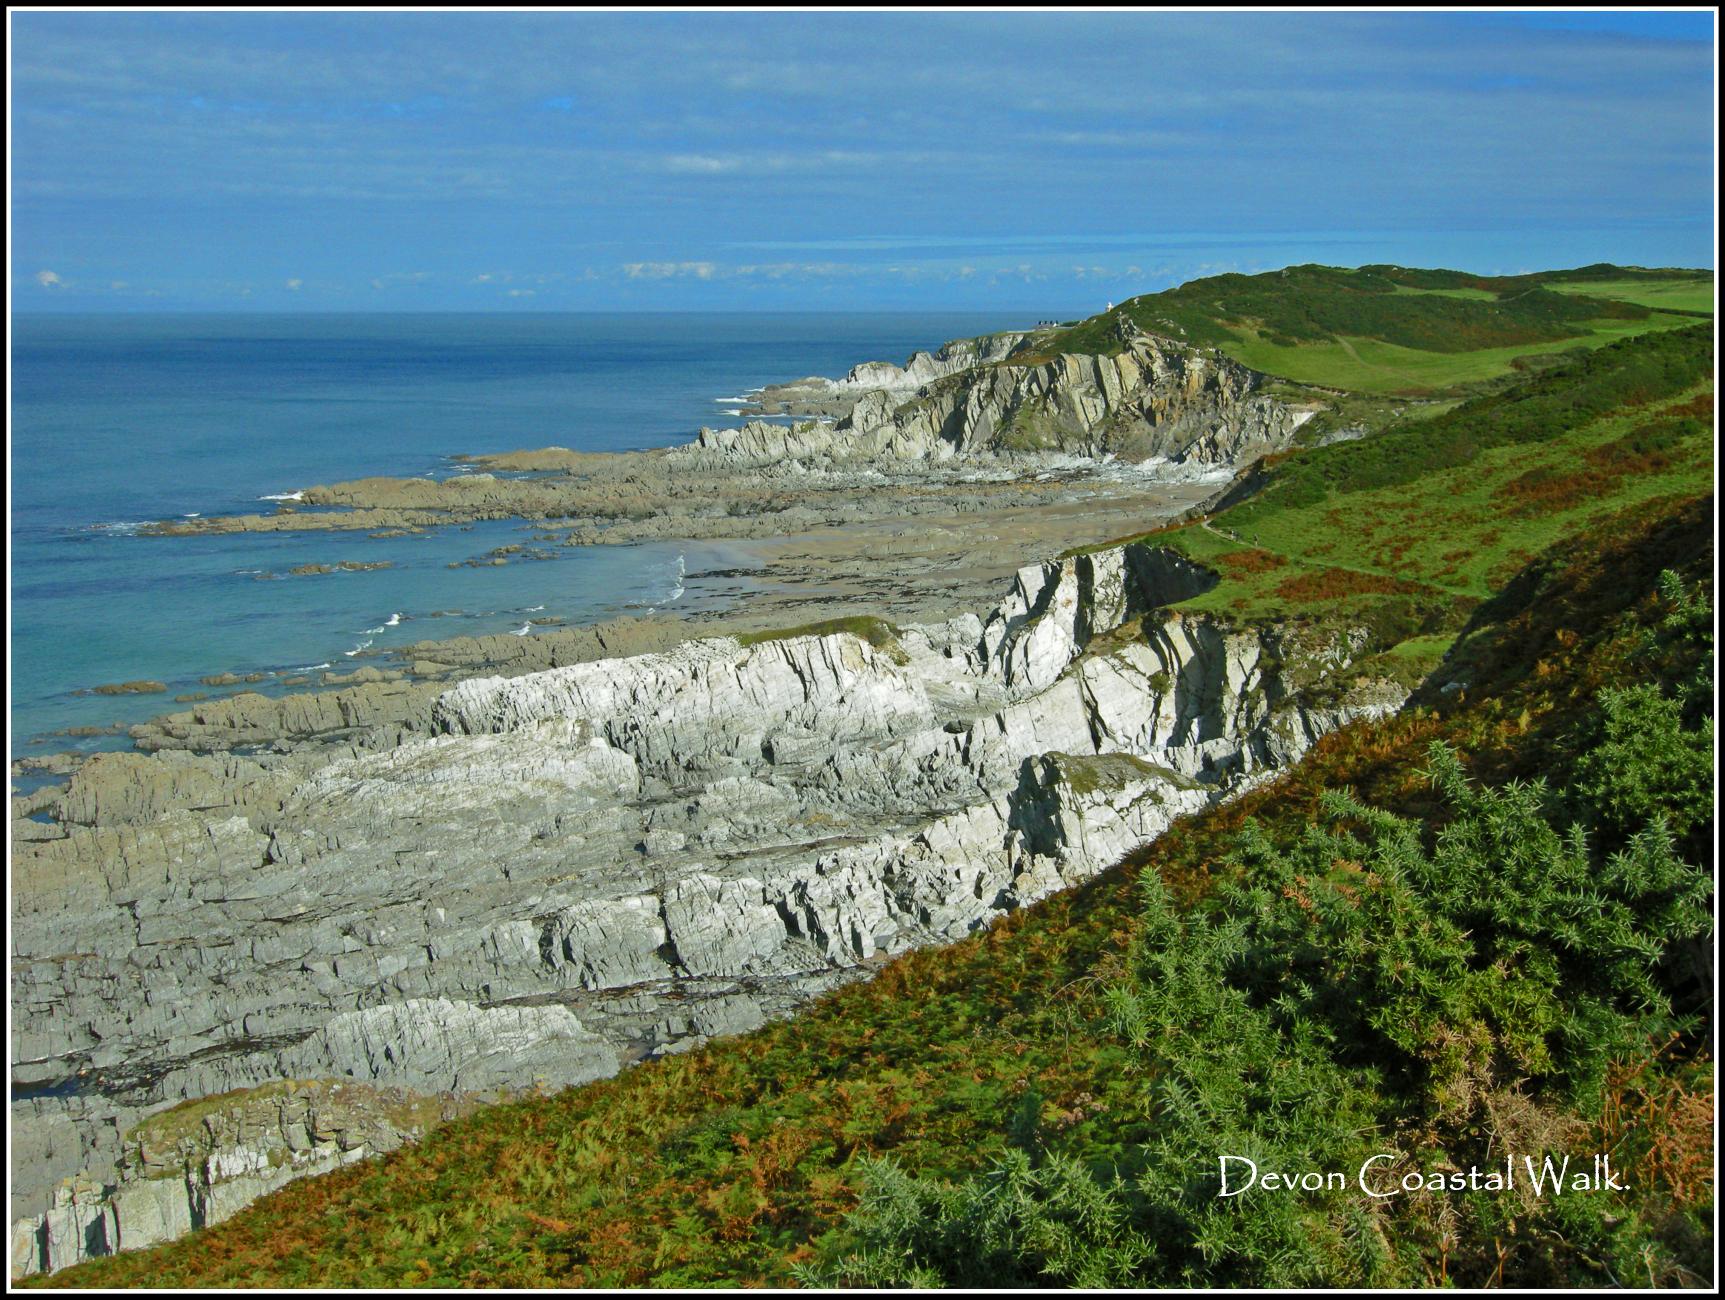 Devon Coastal Walk.